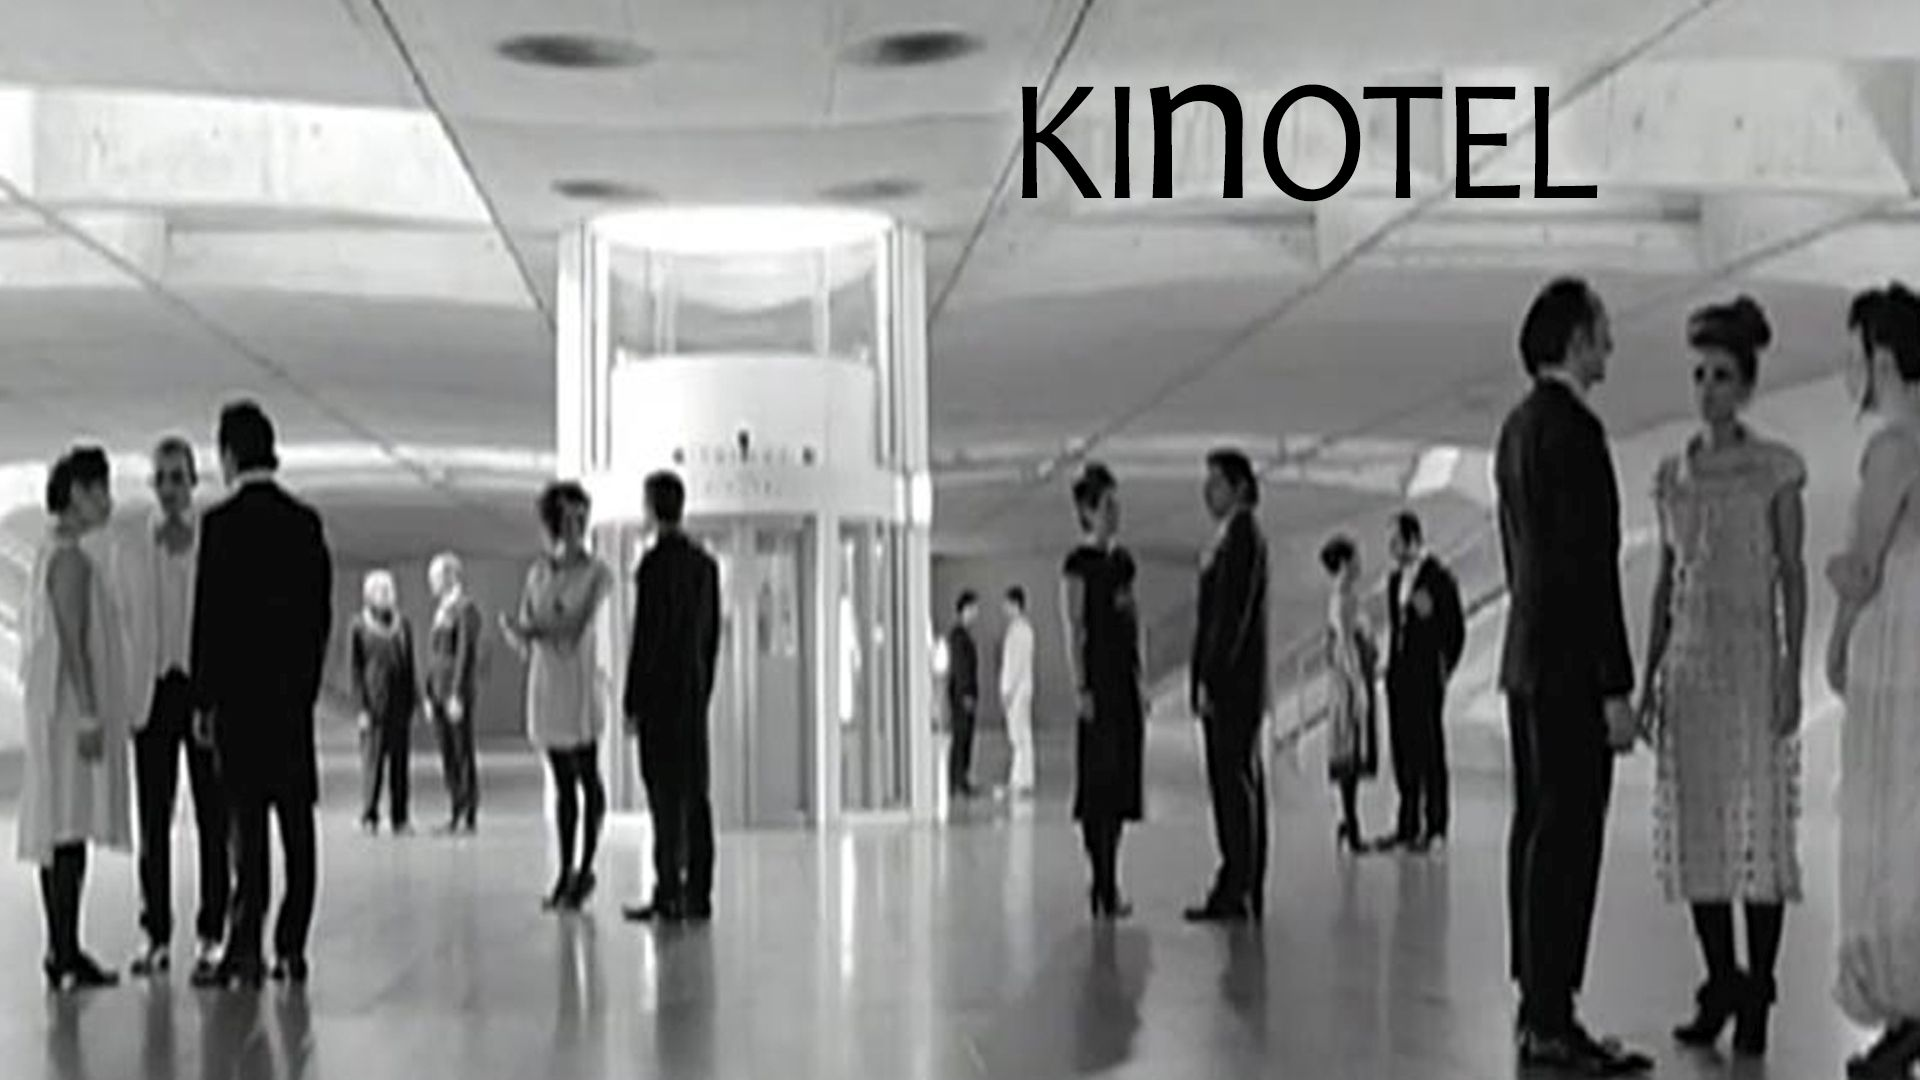 Kinotel